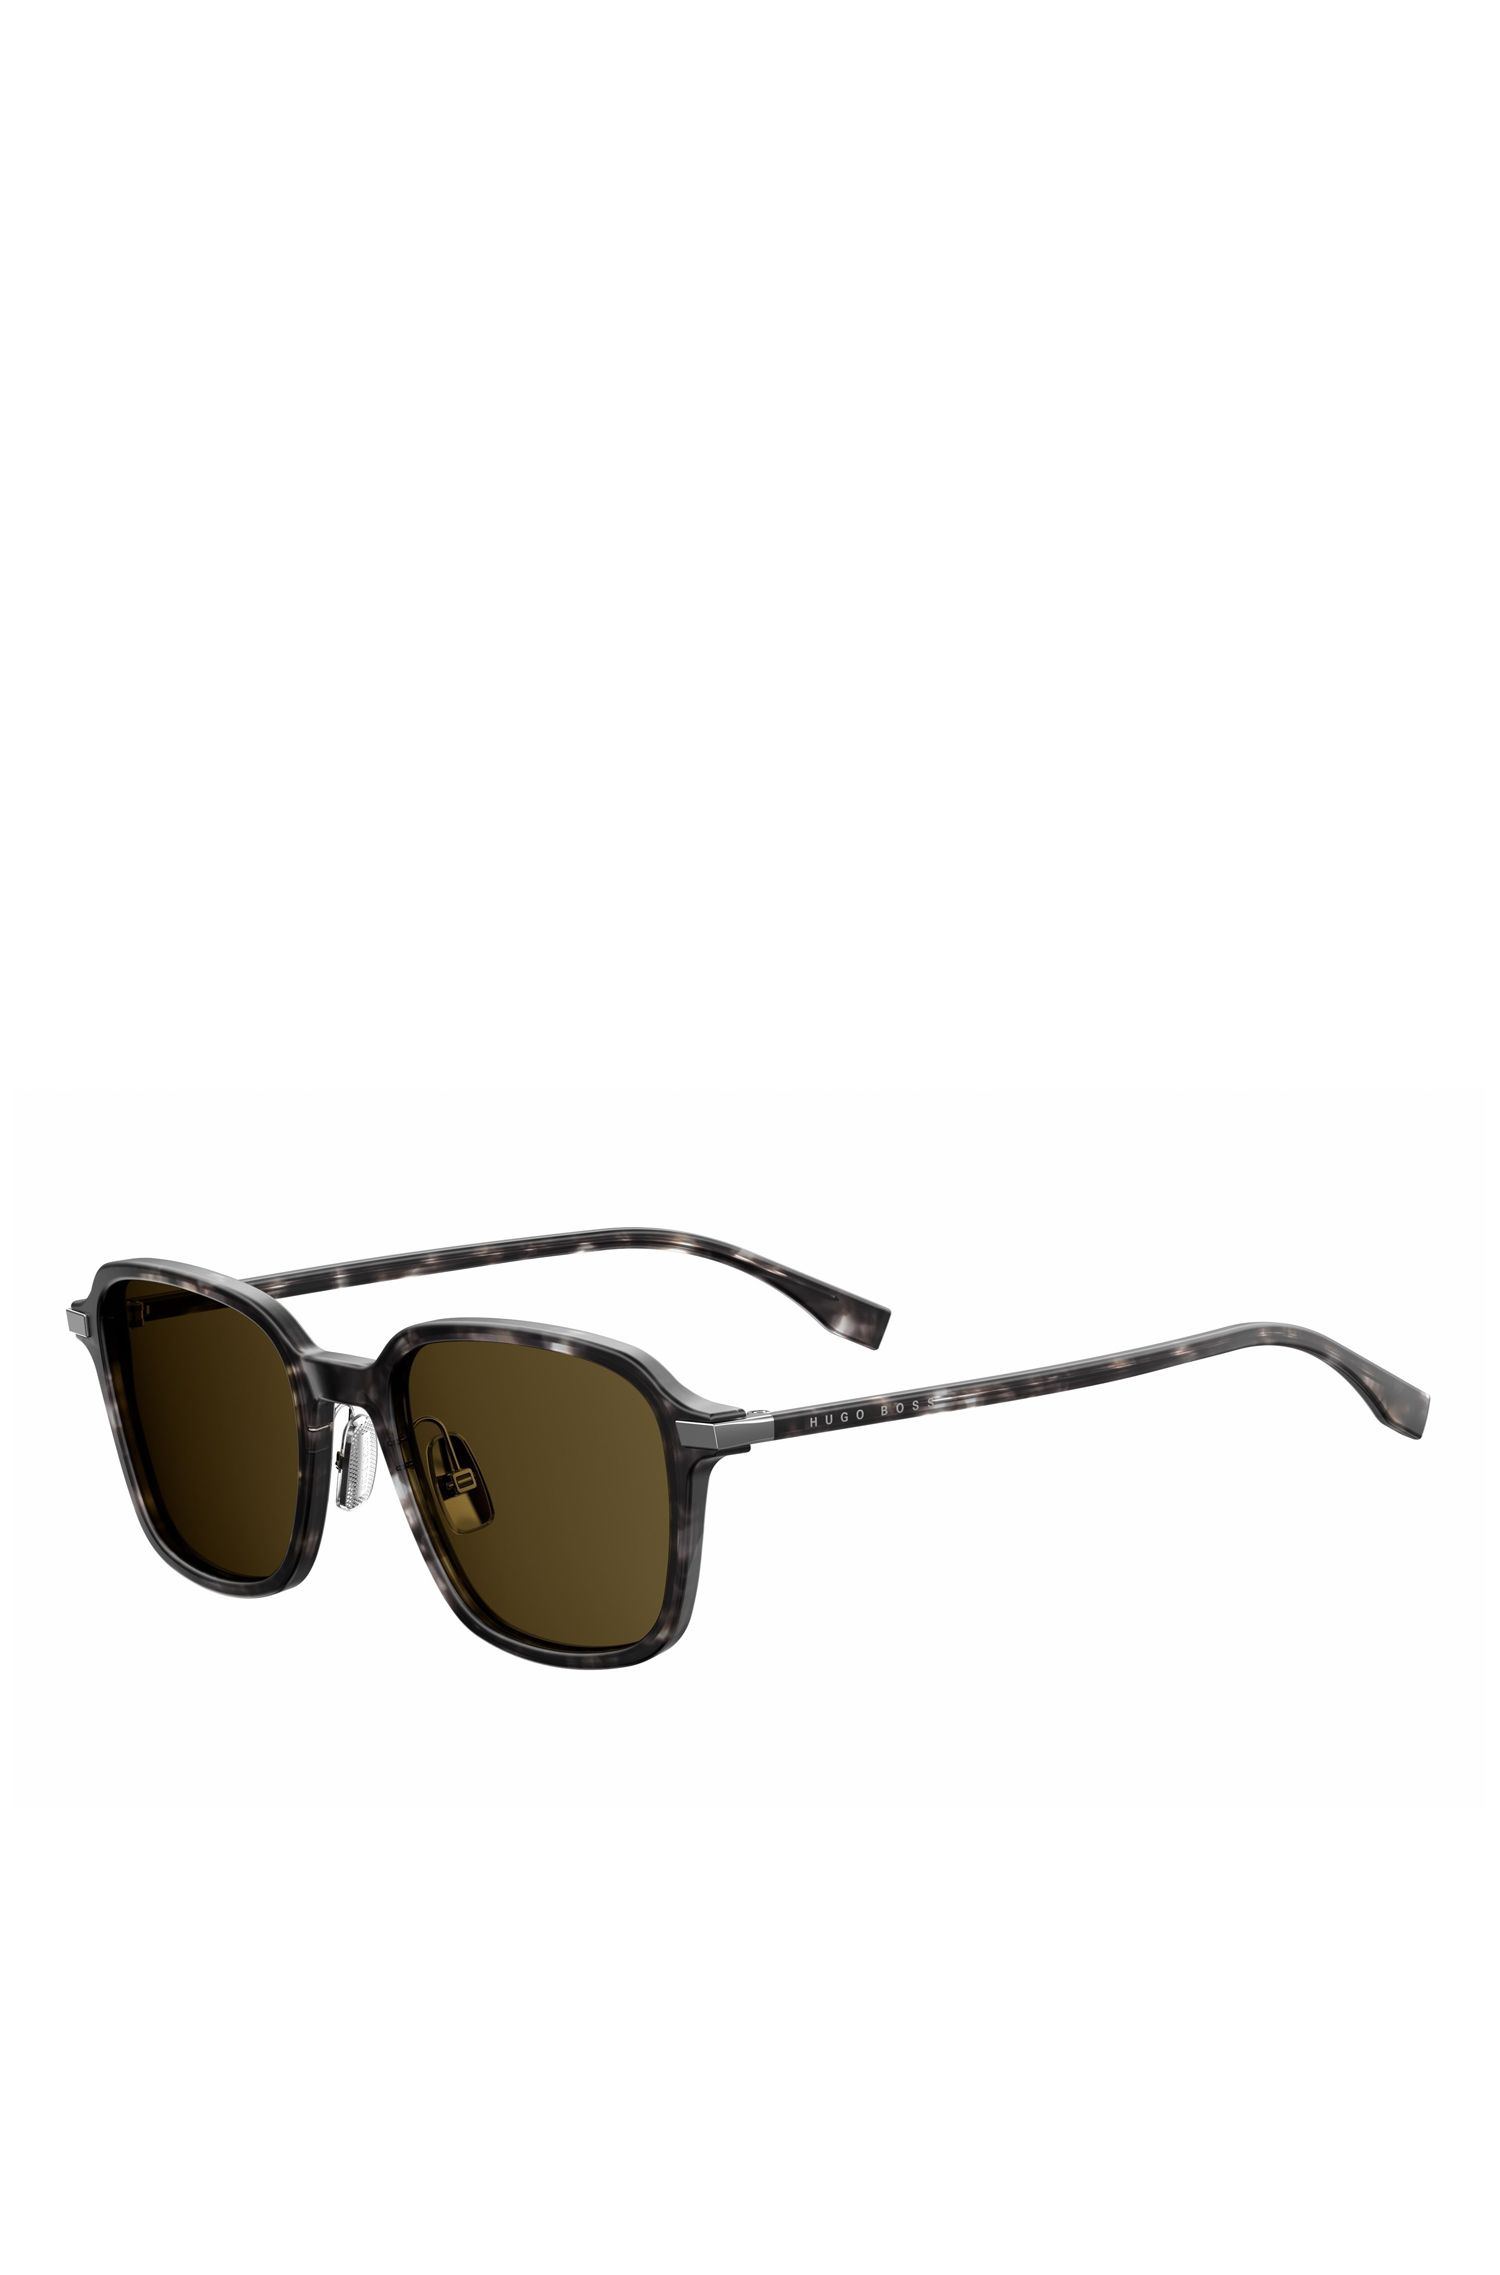 '0909S'   Brown Lens Havana Square Sunglasses